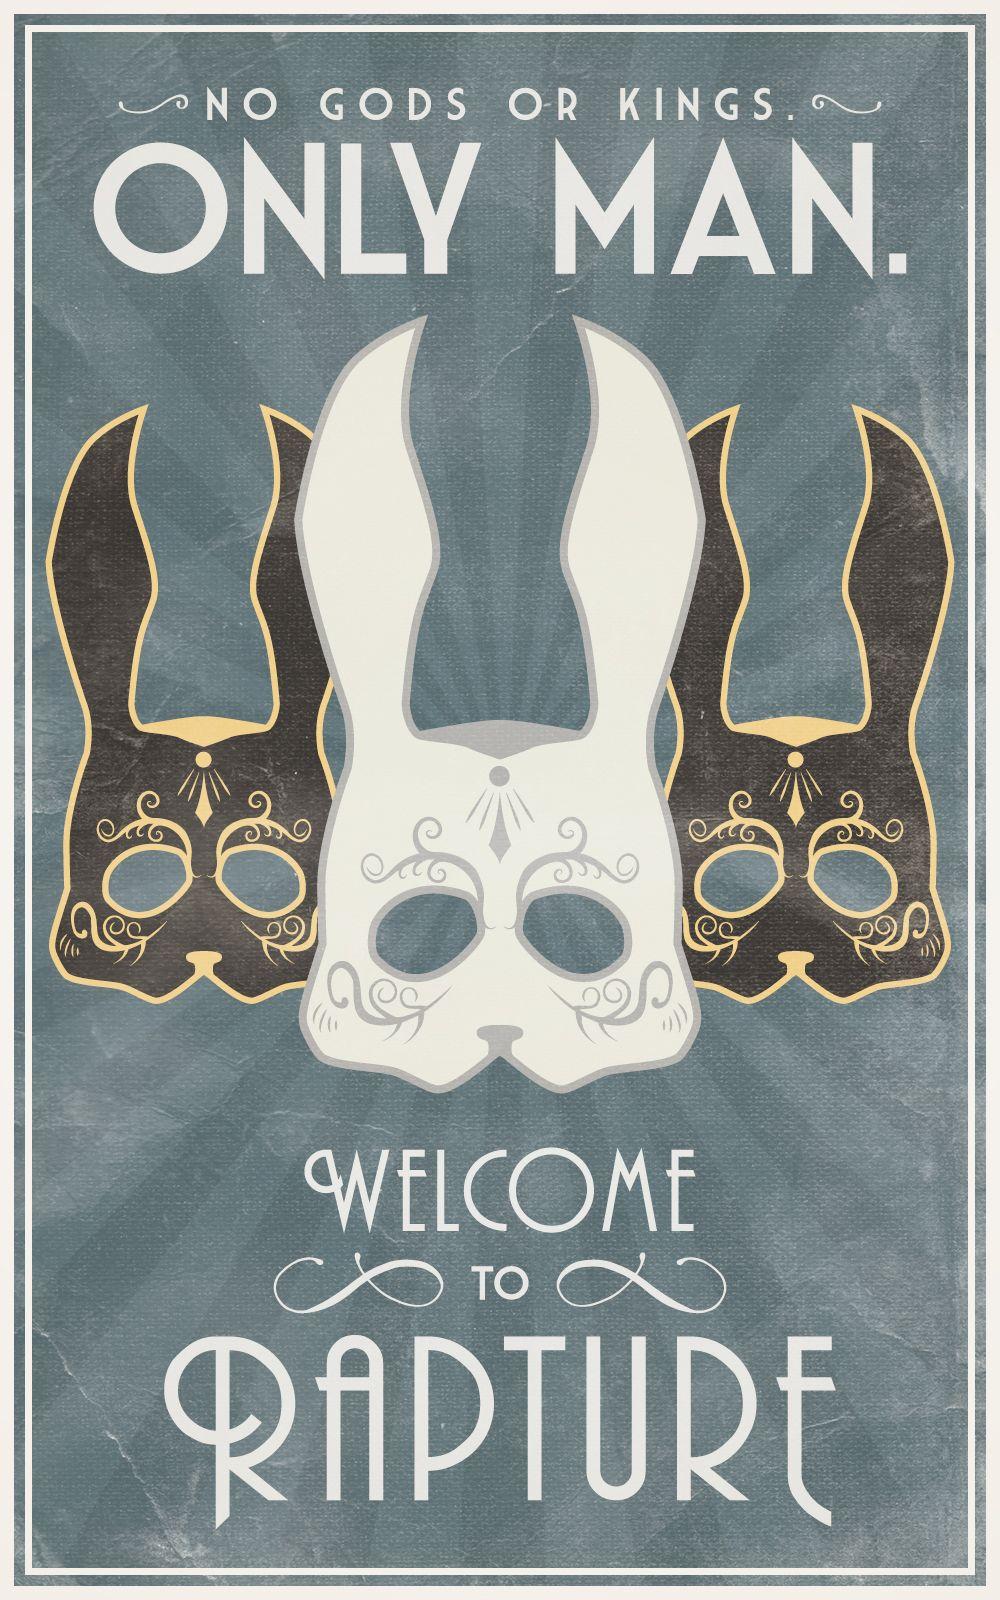 bioshock masquerade poster created by bianca baumann bioshock pinterest tattoo ideen. Black Bedroom Furniture Sets. Home Design Ideas